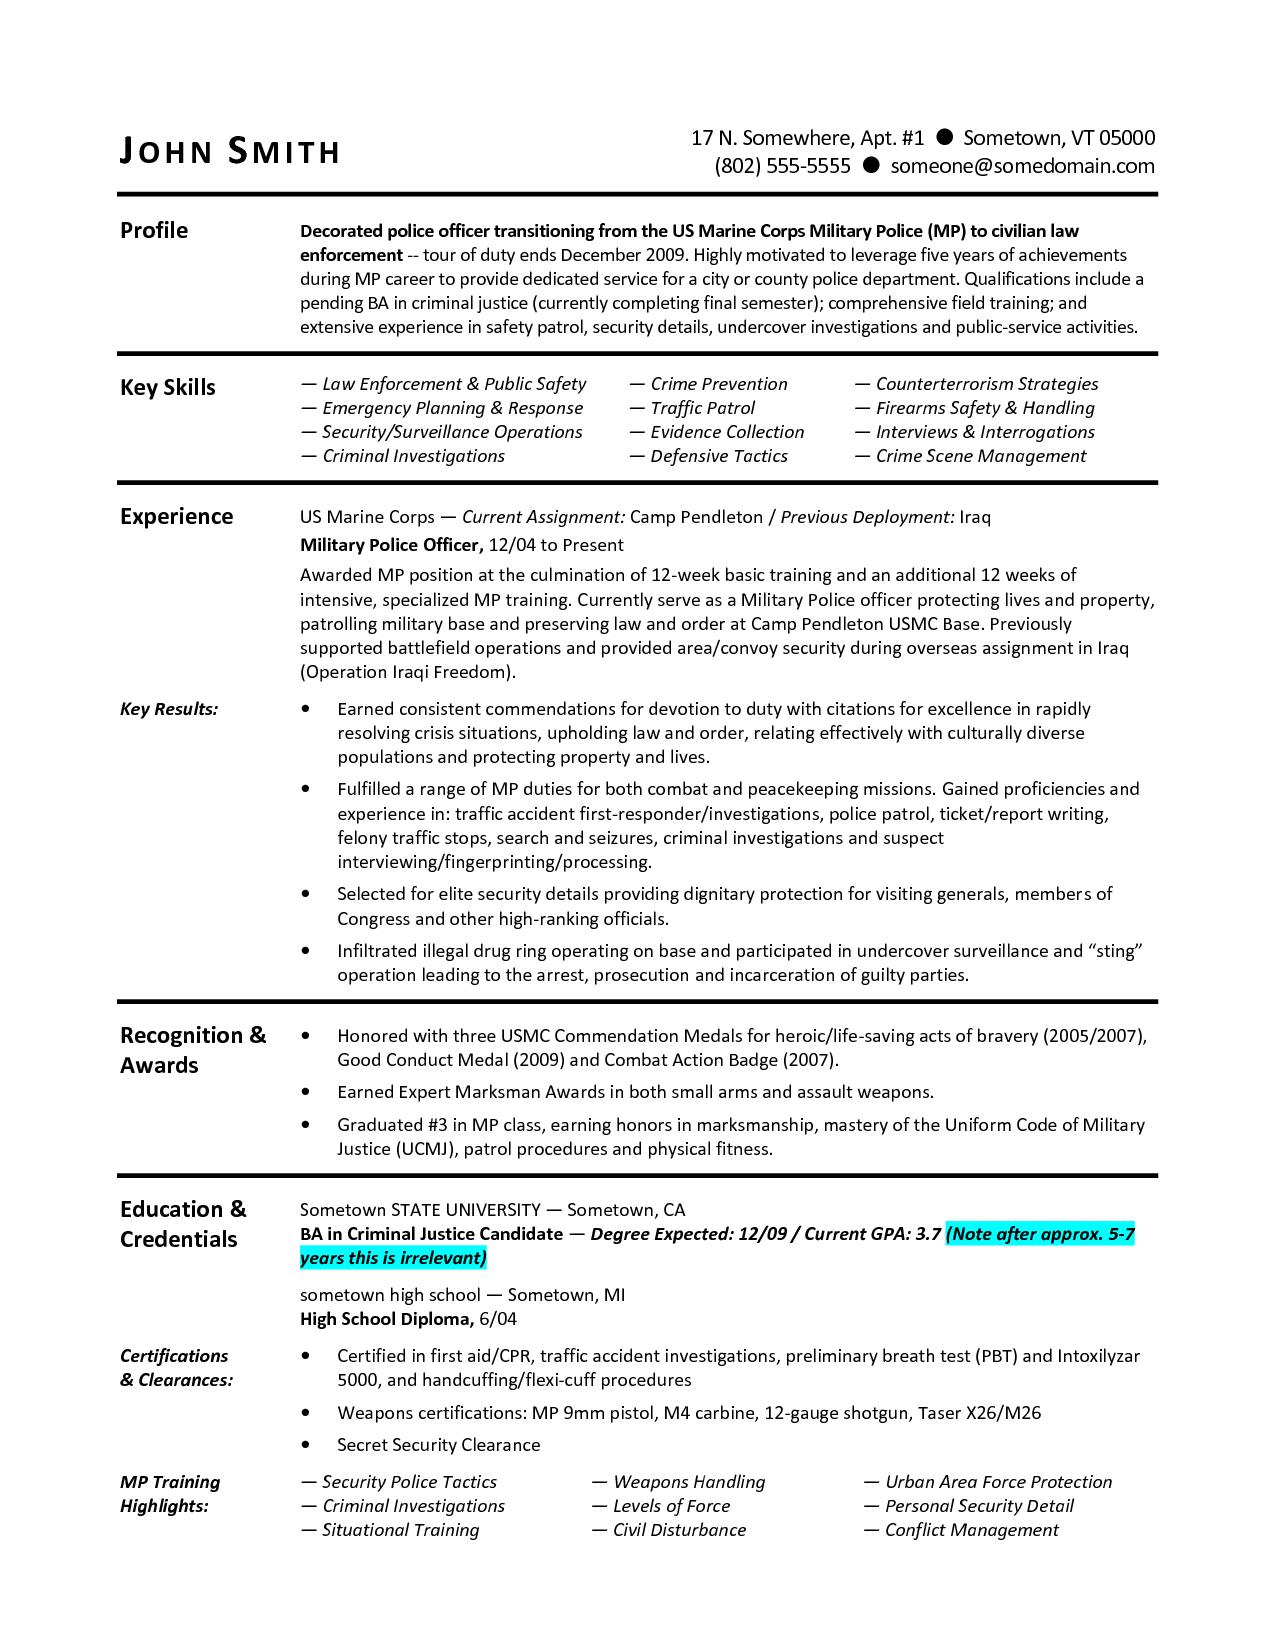 basic pilot resume templates resume resume for airline pilots usaf thunderbirds resume flight schedule will perform